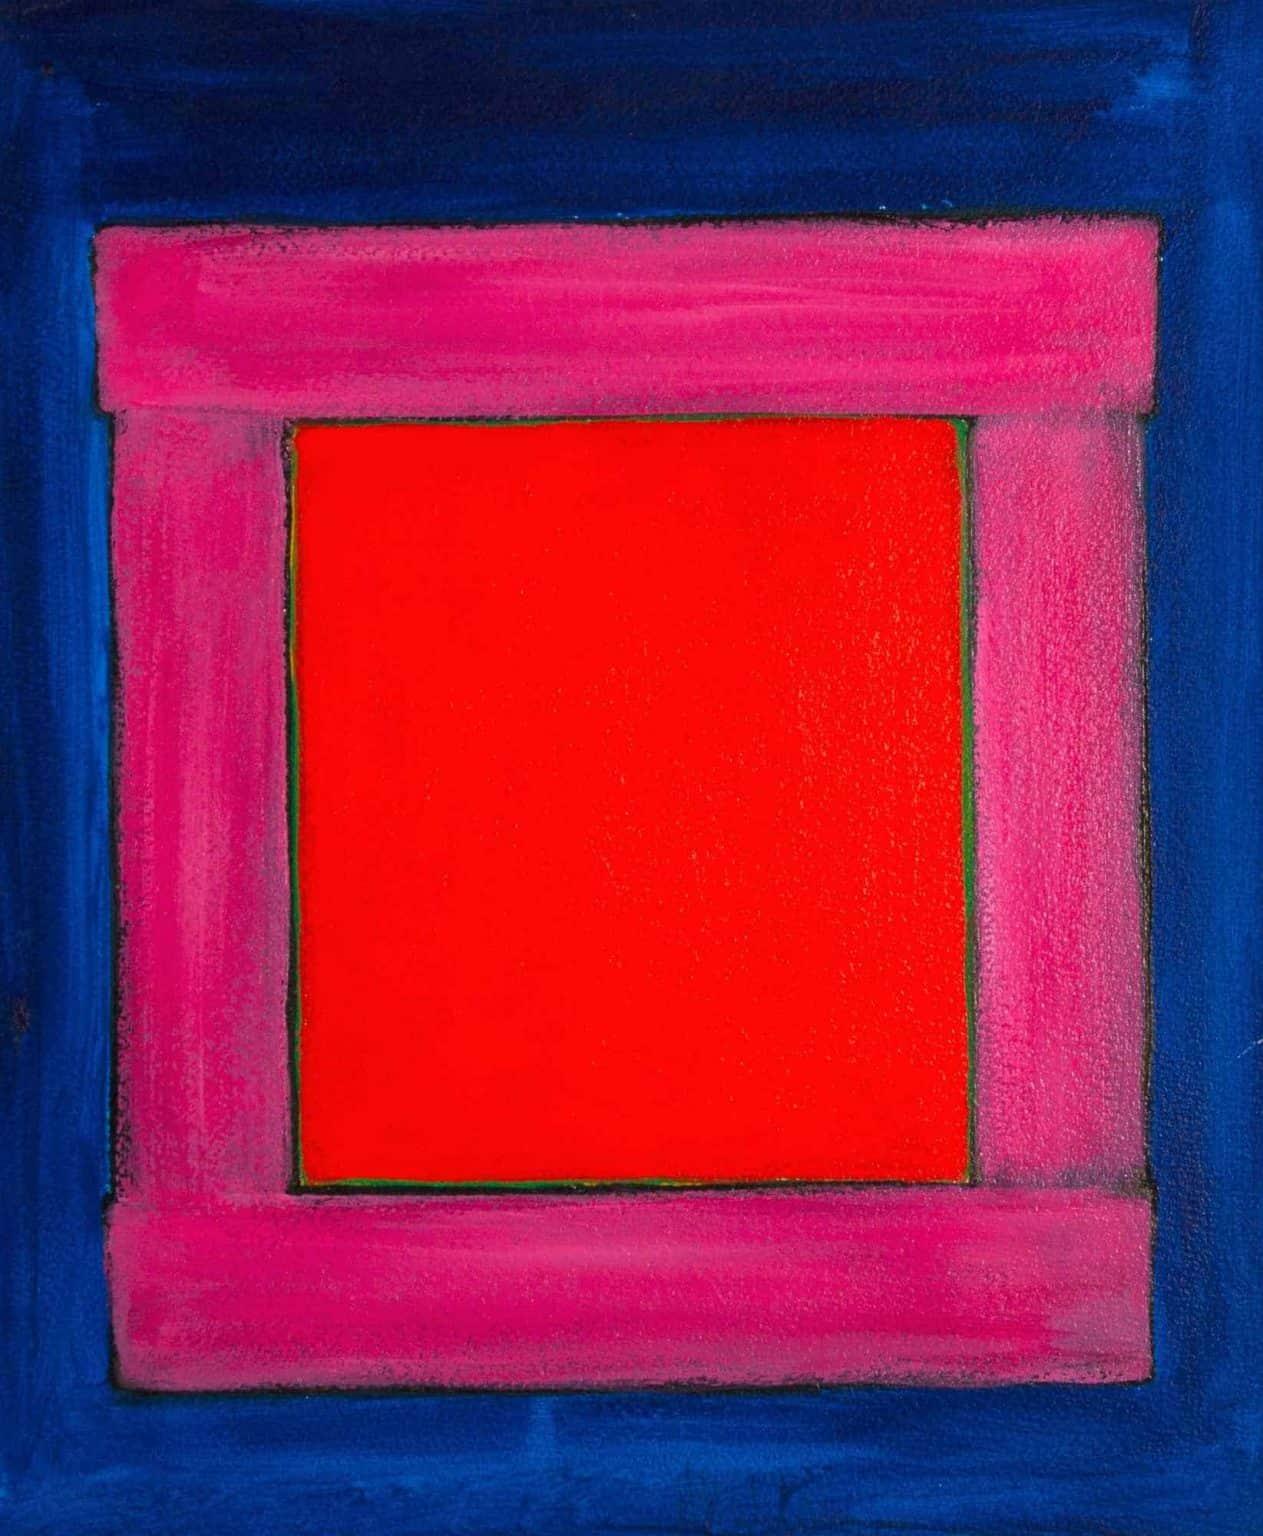 "Harold Joe Waldrum, early window painting, acrylic on paper mounted on canvas, 18 x 15"""